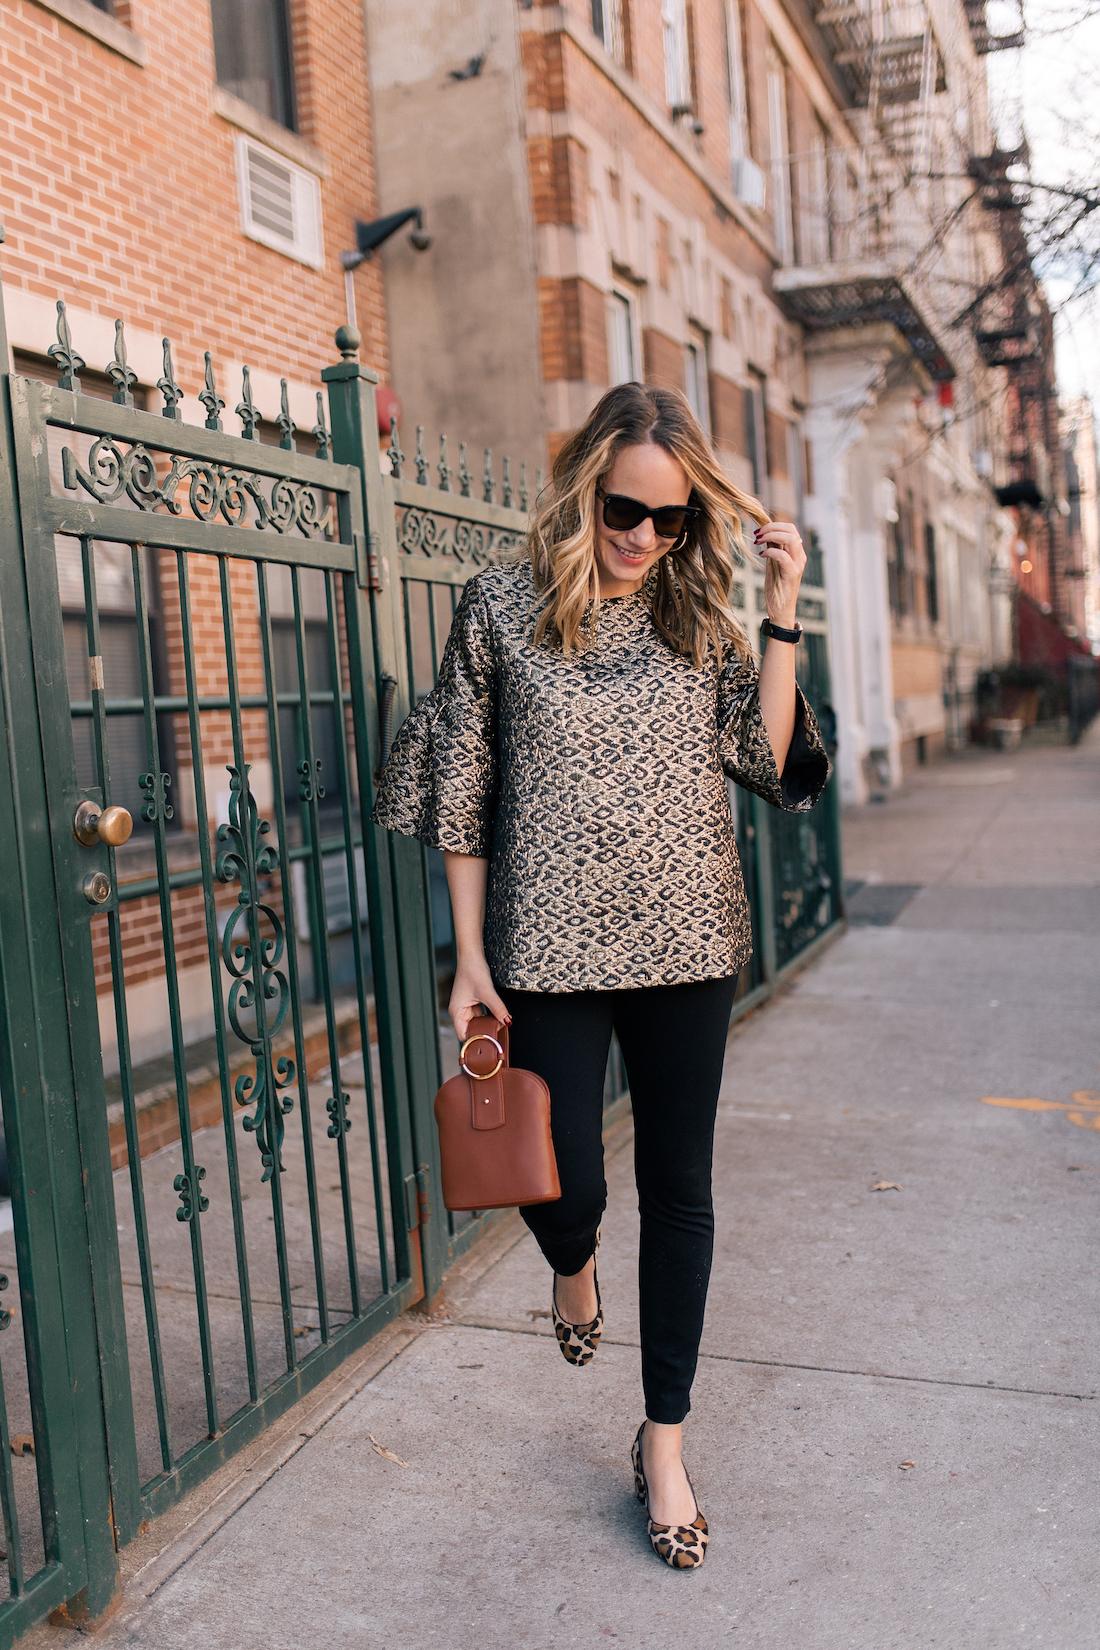 Madewell Coat // Tuckernuck Top(c/o) // NYDJ Leggings // Margaux Heels// Polaroid Sunglasses // Parisa Wang Bag(c/o)